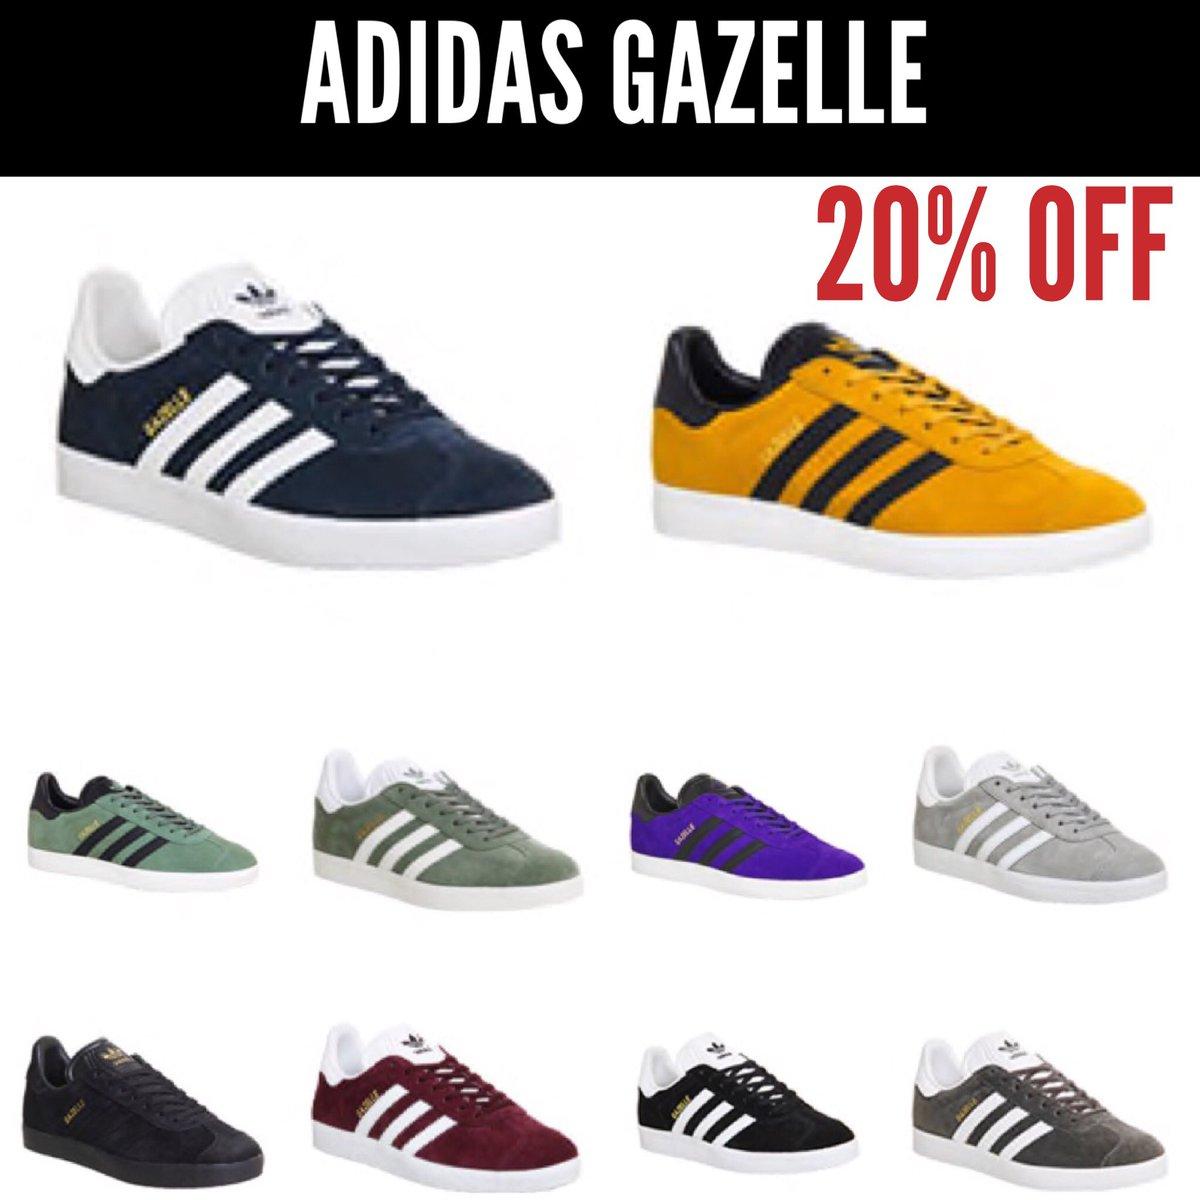 adidas gazelle discount code